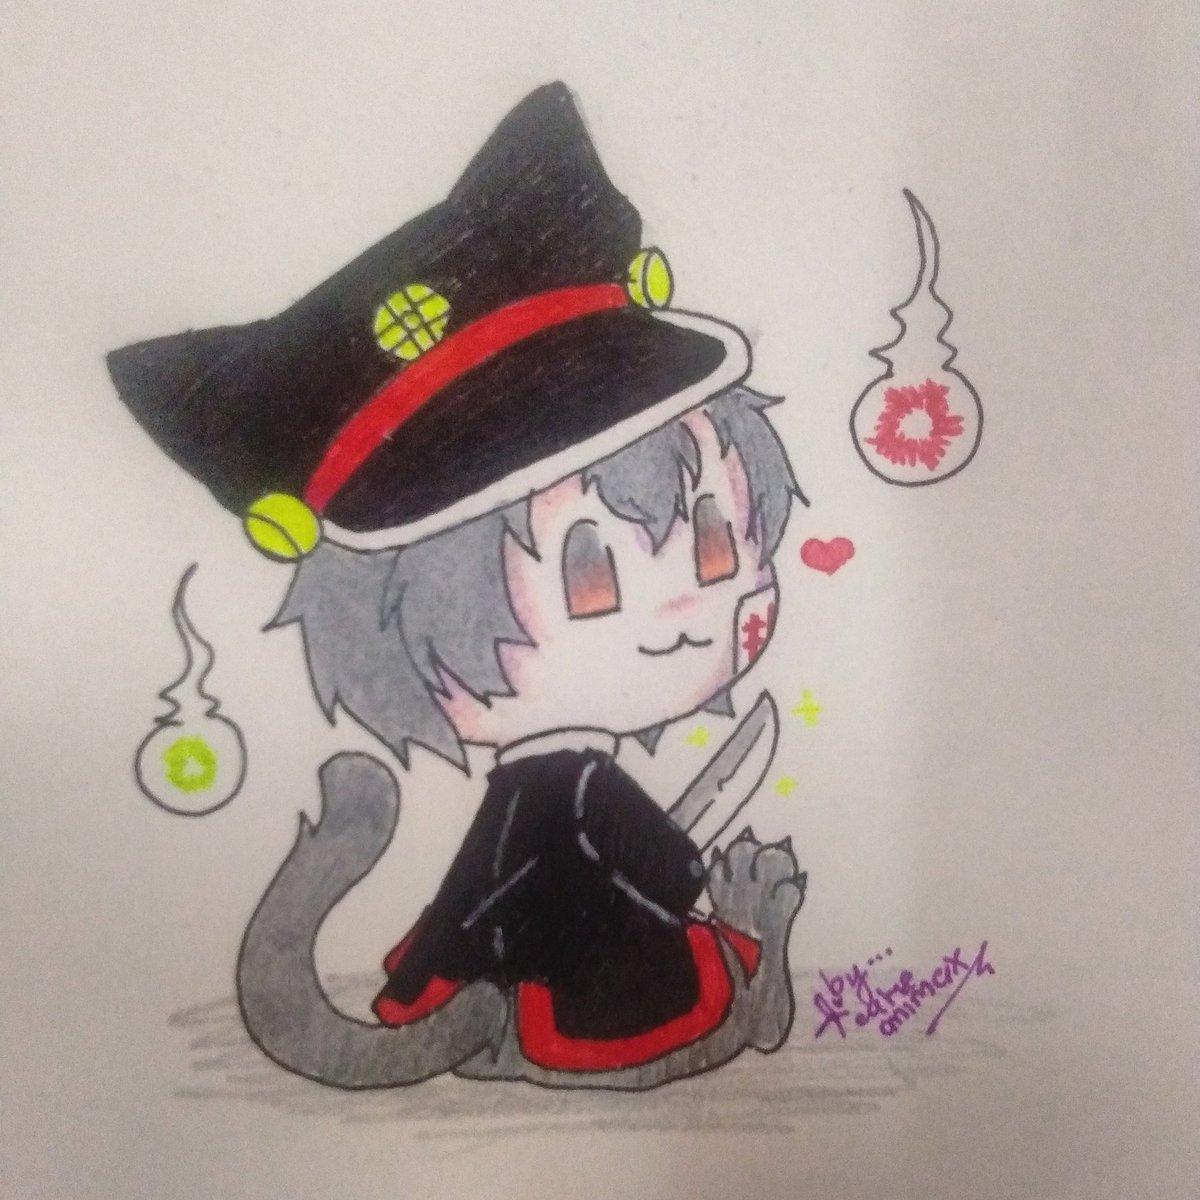 Just drawing...  ... #hanakokun...  ... #toiletboundhanakokun #anime #animedraw #animedrawing #animedoodle #animefanart #animechibi #draw #drawing #doodle #fanart #chibi...pic.twitter.com/PXO2Cy9xmx